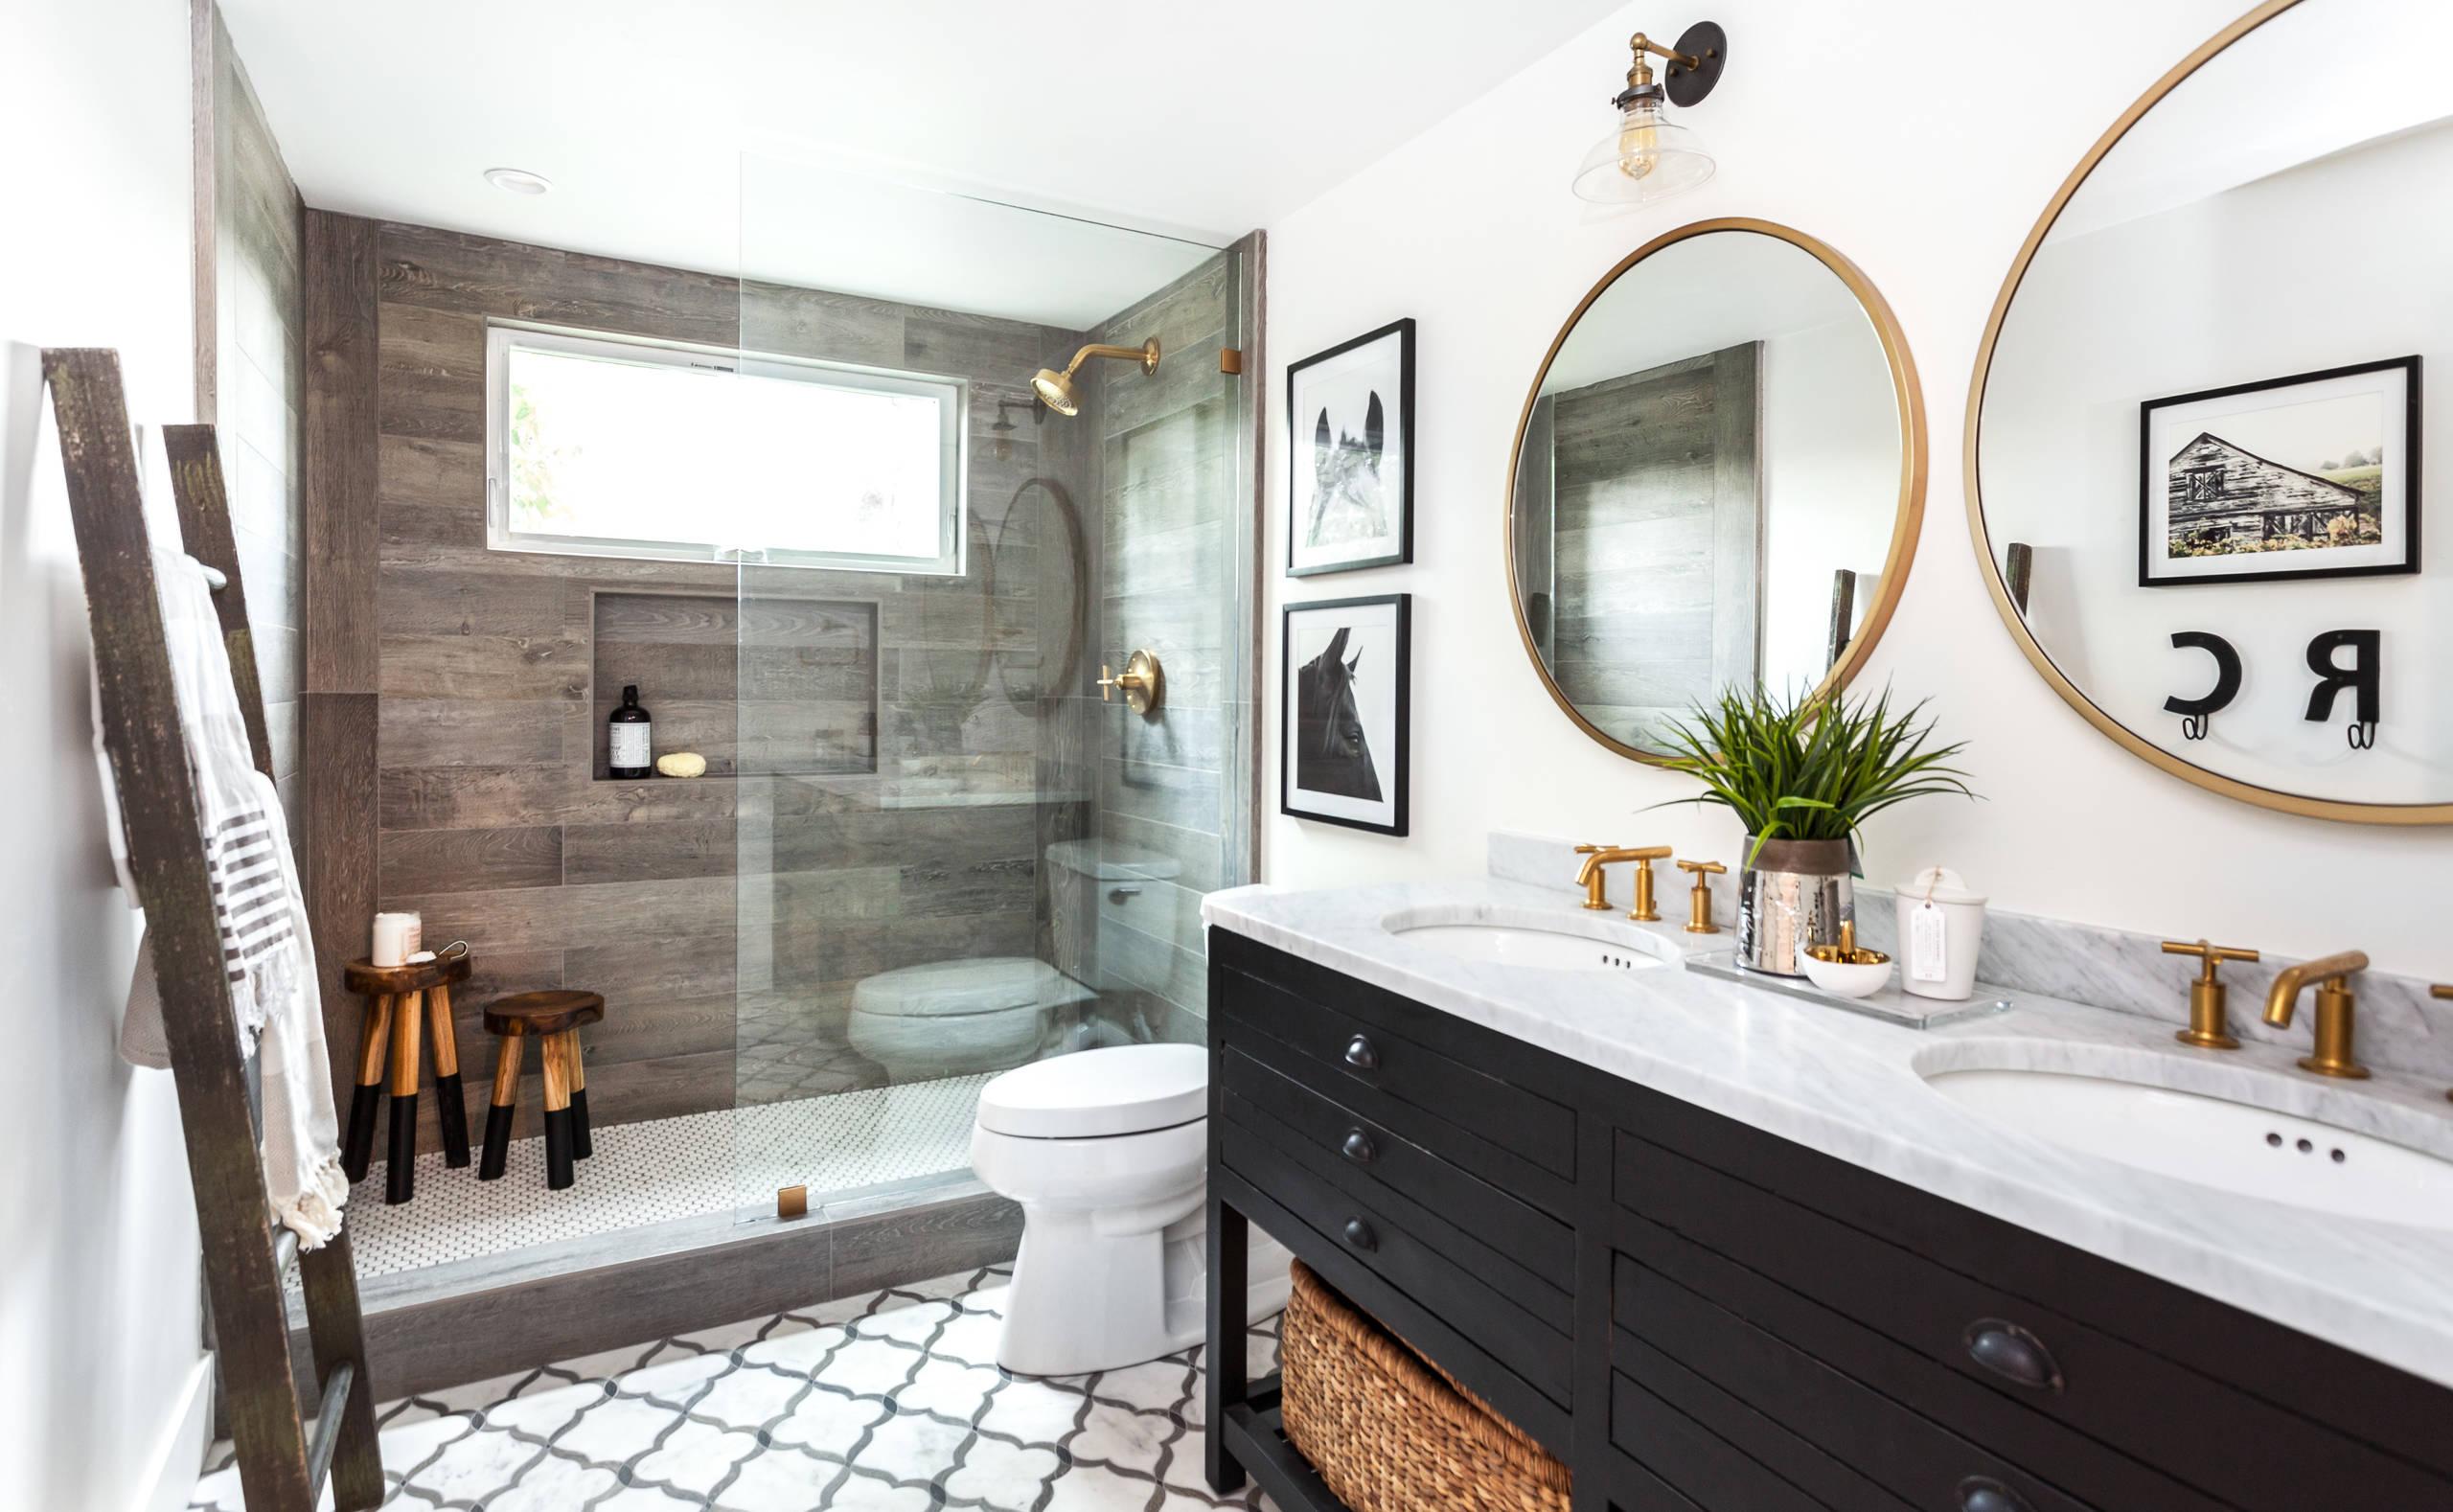 75 Beautiful Farmhouse Bathroom Pictures Ideas February 2021 Houzz